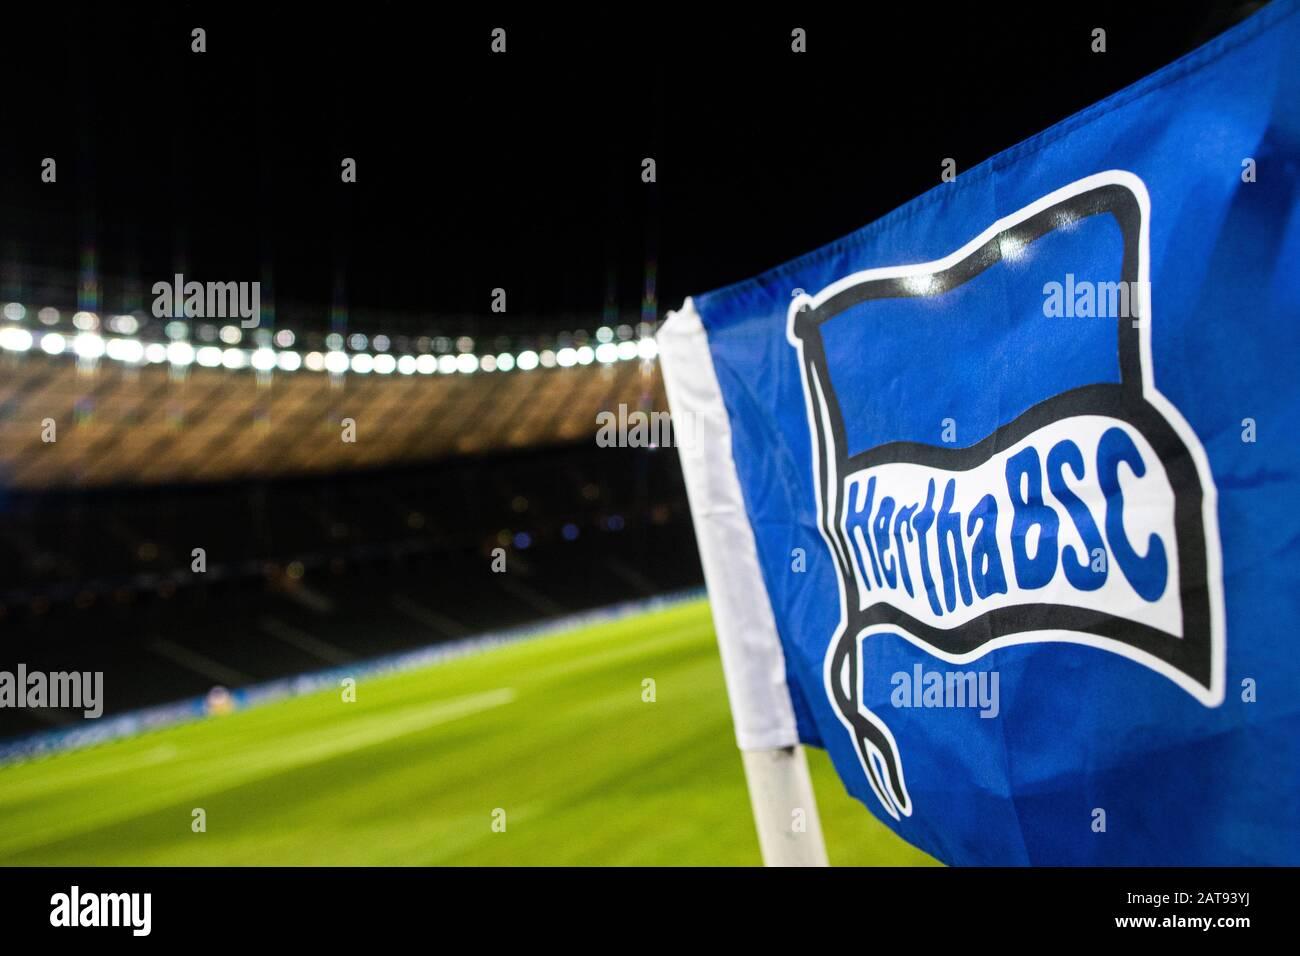 firo: 31.01.2020, Fuvuball, 1.Bundesliga, season 2019/2020, Hertha BSC Berlin - FC Schalke 04 Hertha BSC symbolfoto, detail   usage worldwide Stock Photo